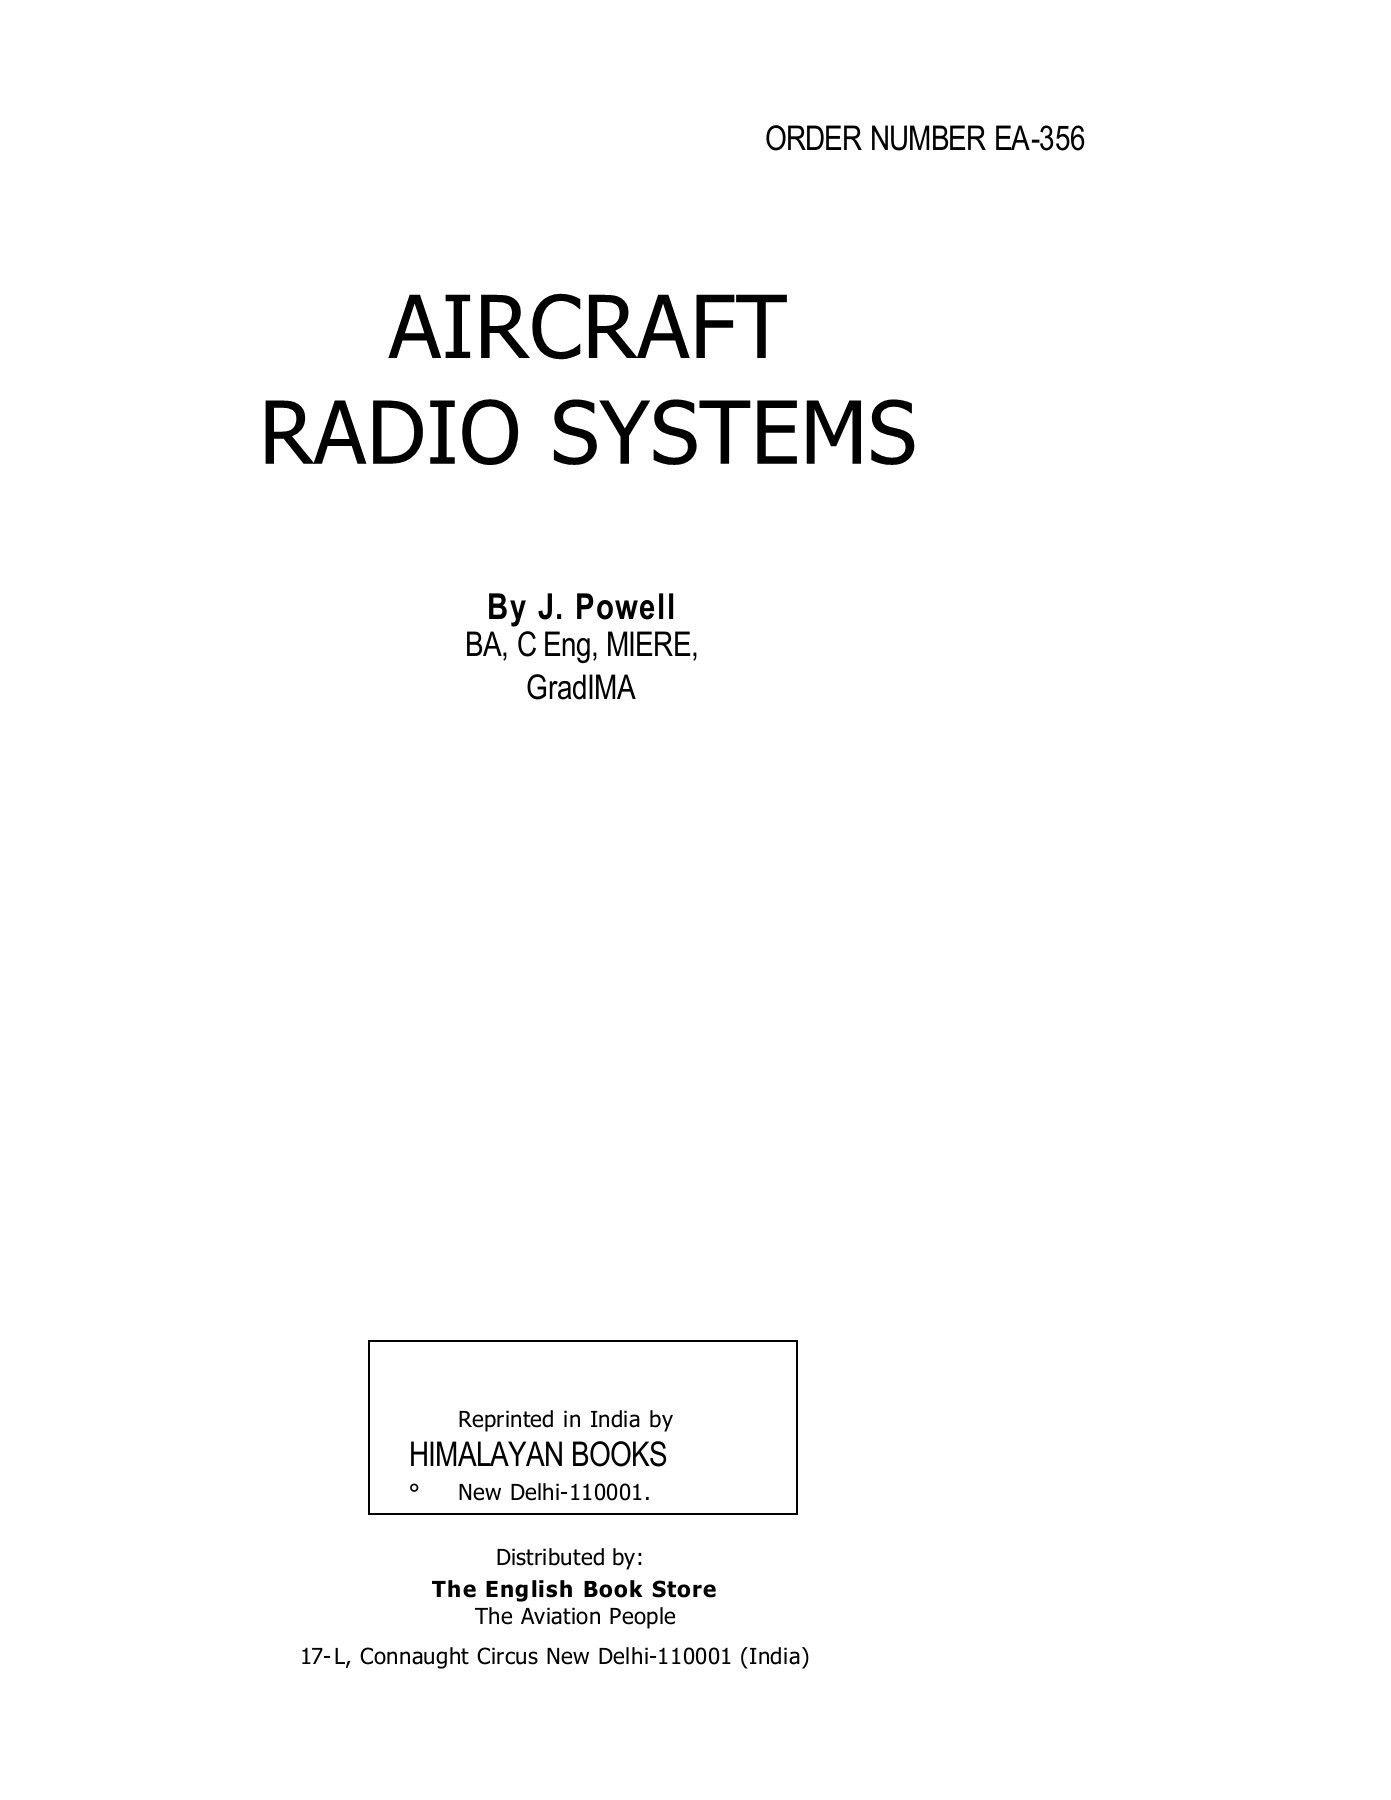 Unique Aircraft Ptt Wiring Diagram